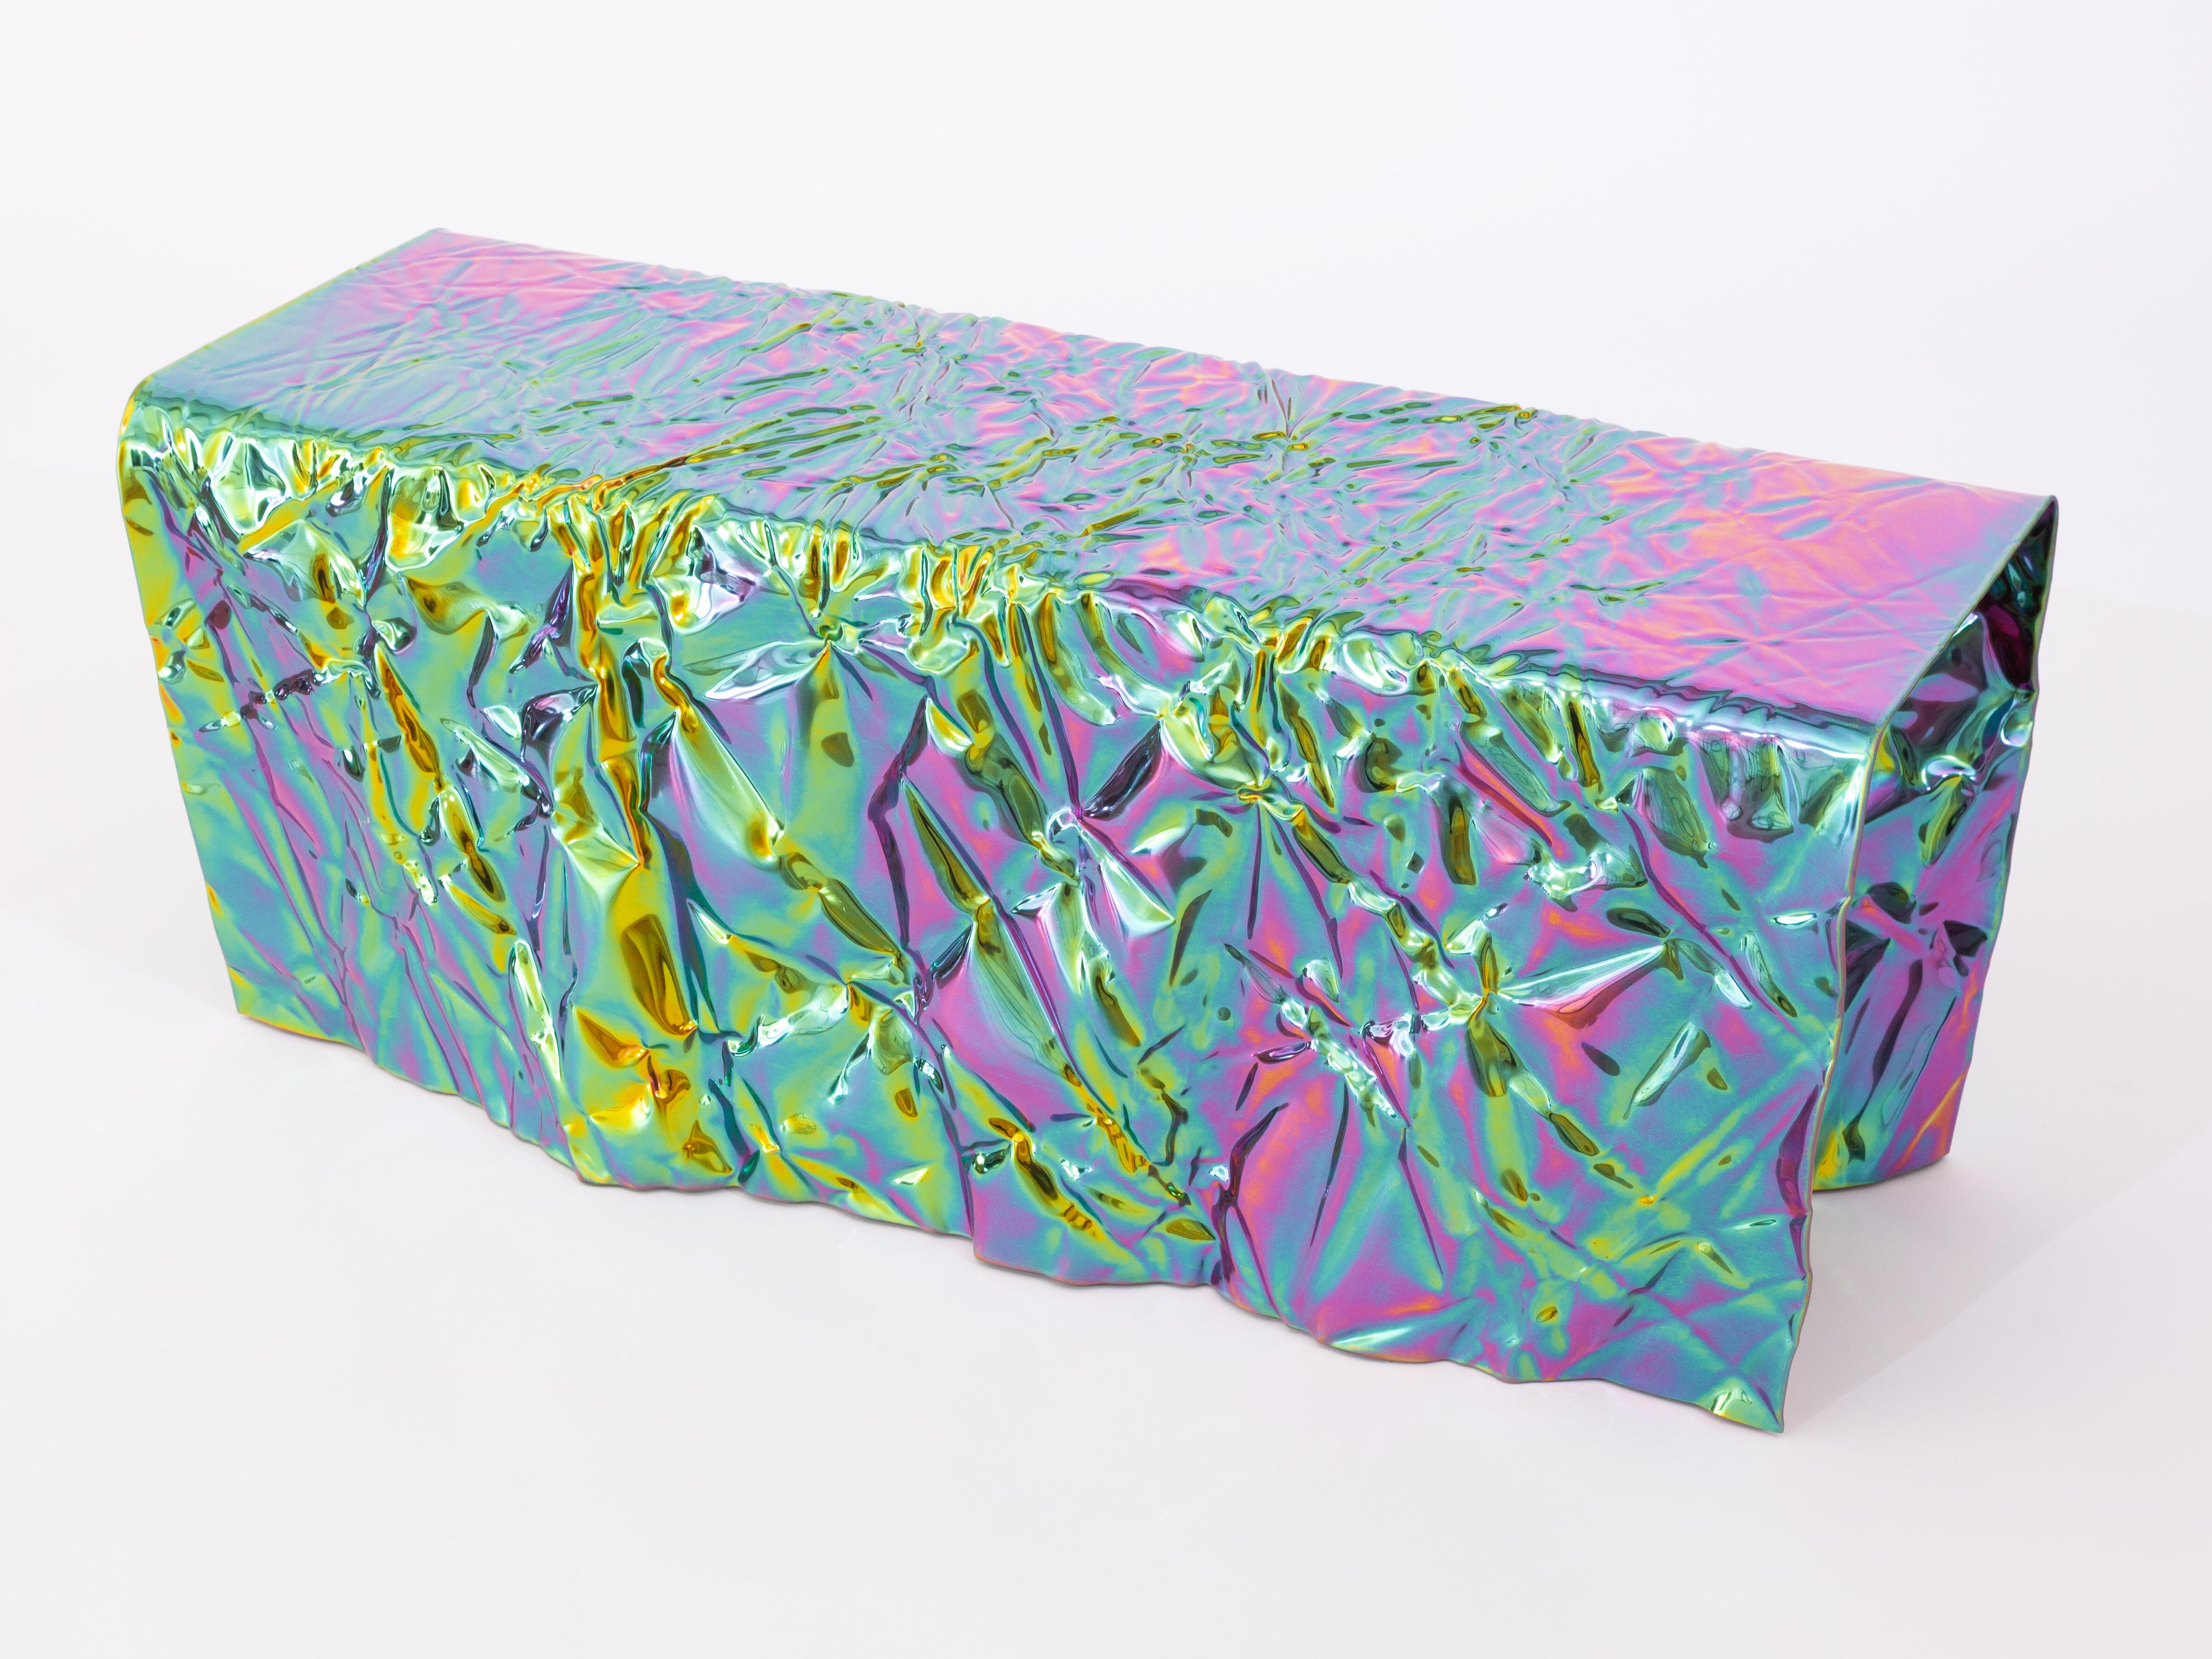 rainbow iridescent bench